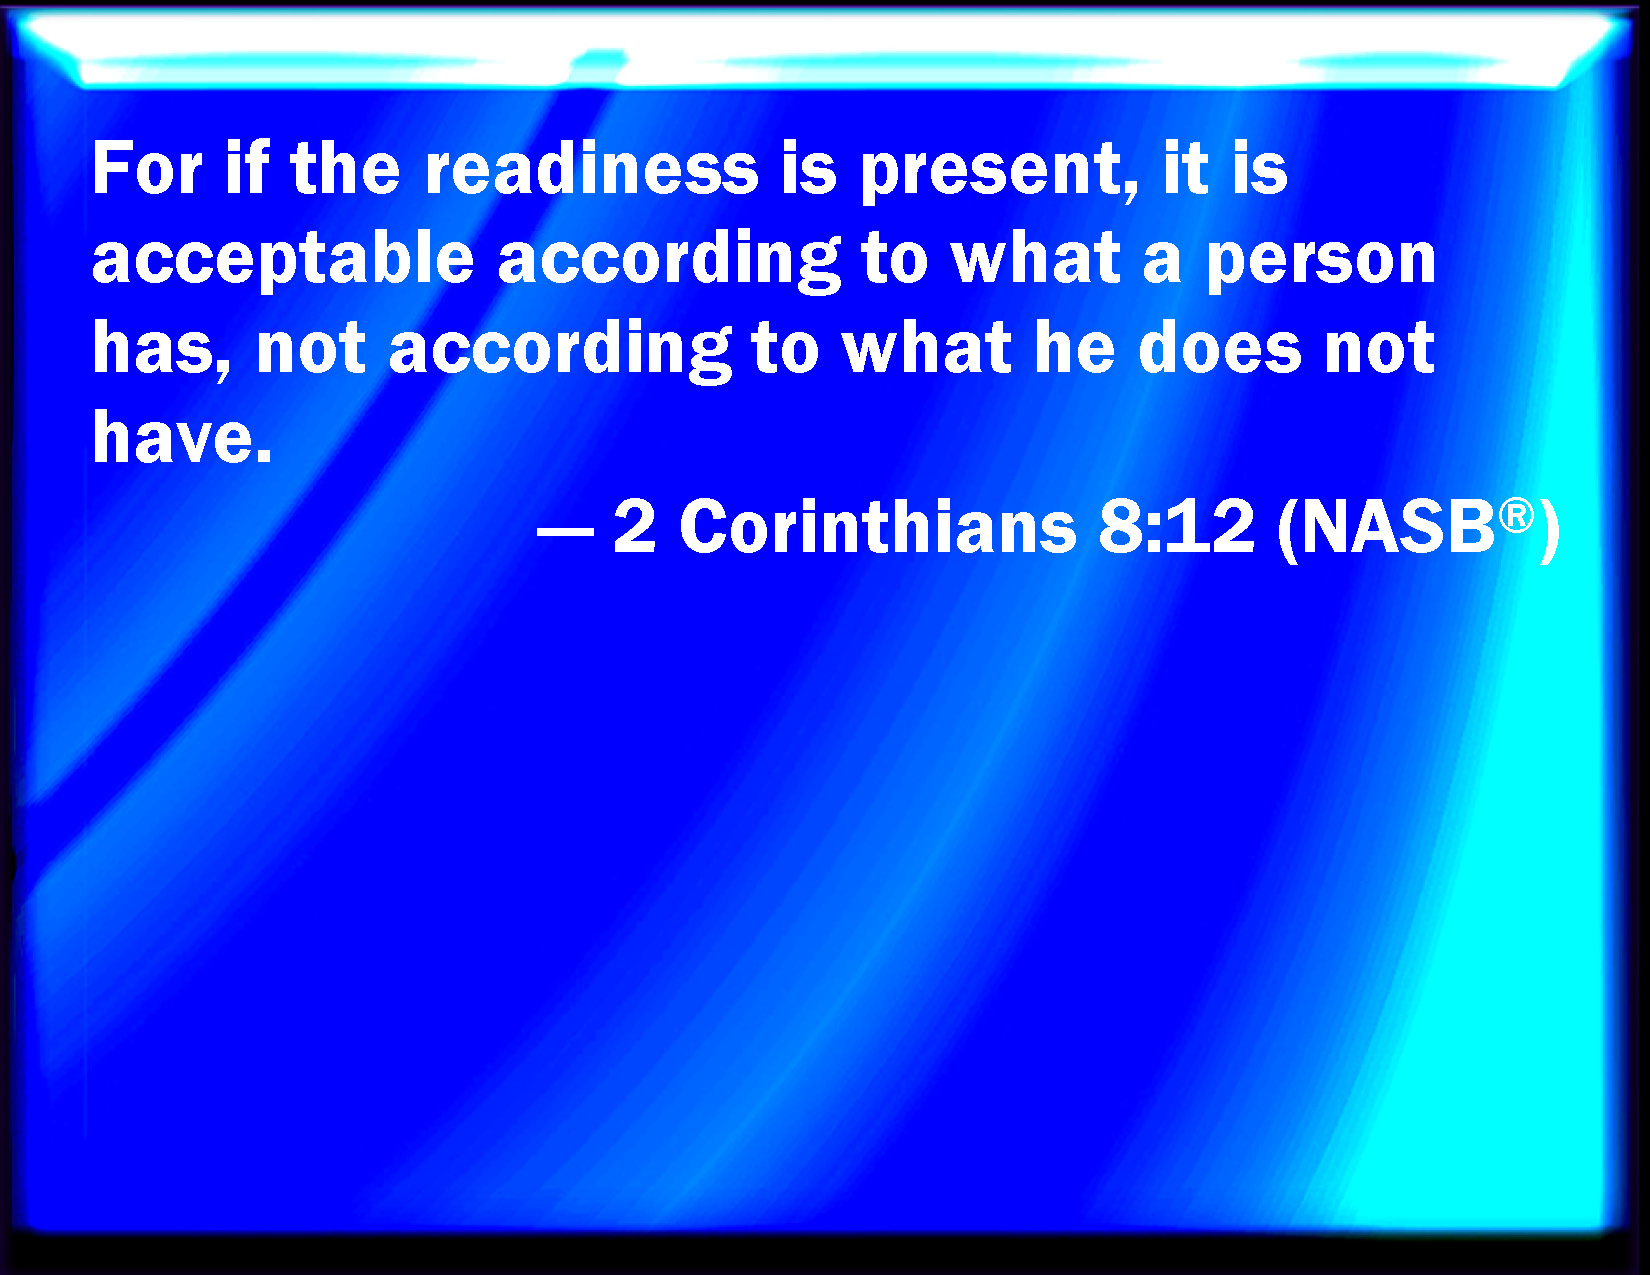 2 Corinthians 8